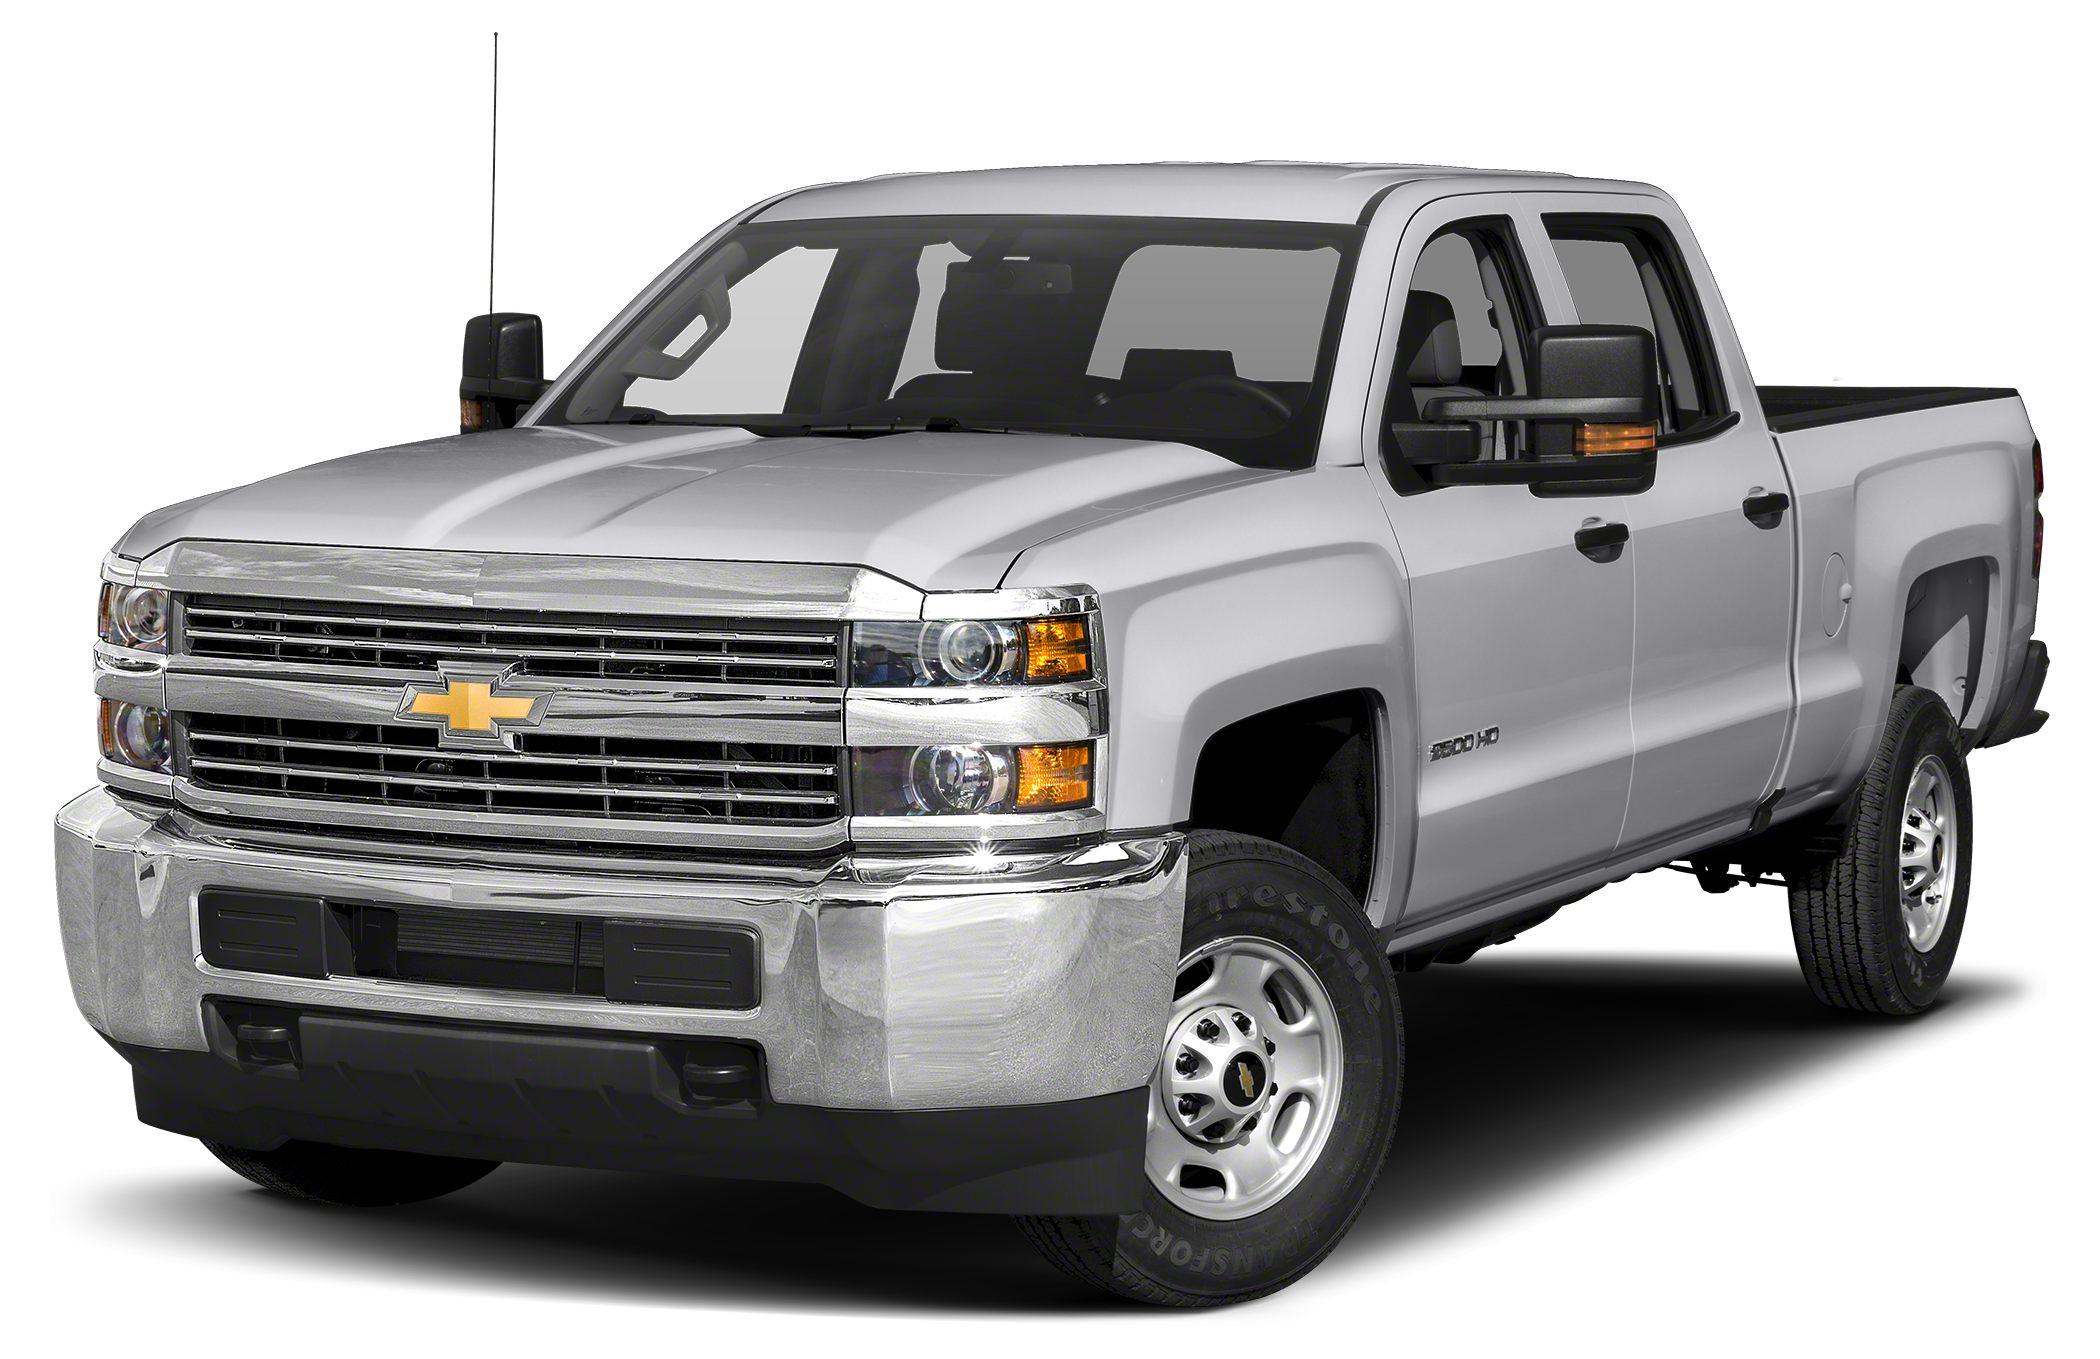 2018 Chevrolet Silverado 3500HD WT Silver Ice Metallic 2018 Chevrolet Silverado 3500HD Work Truck